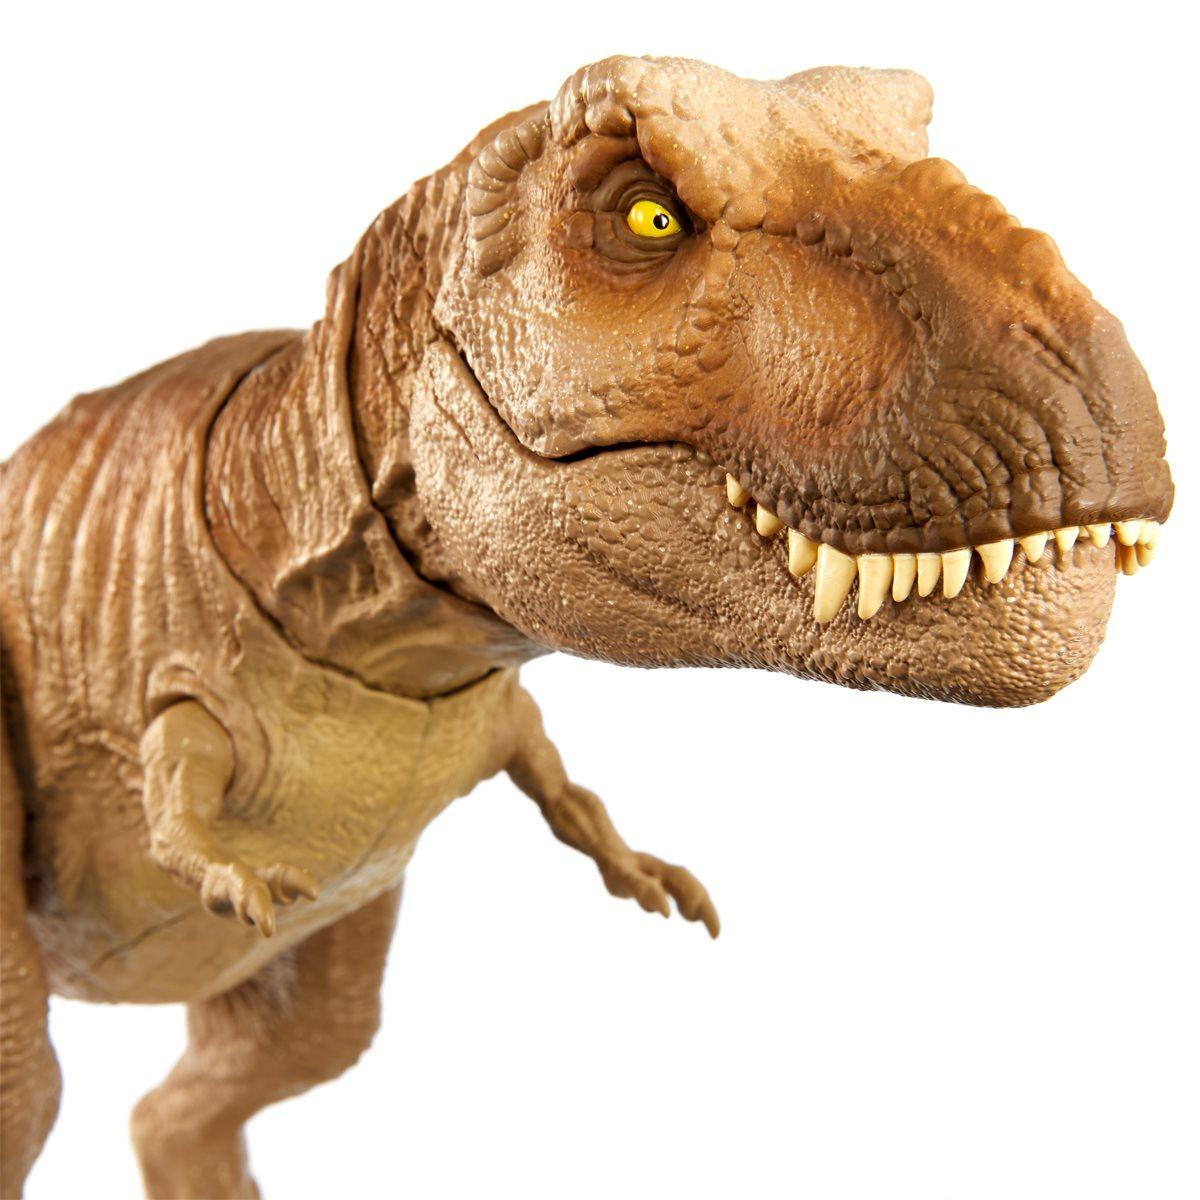 Jurassic World Camp Cretaceous Epic Roarin Tyrannosaurus Rex Jurassic Park T rex